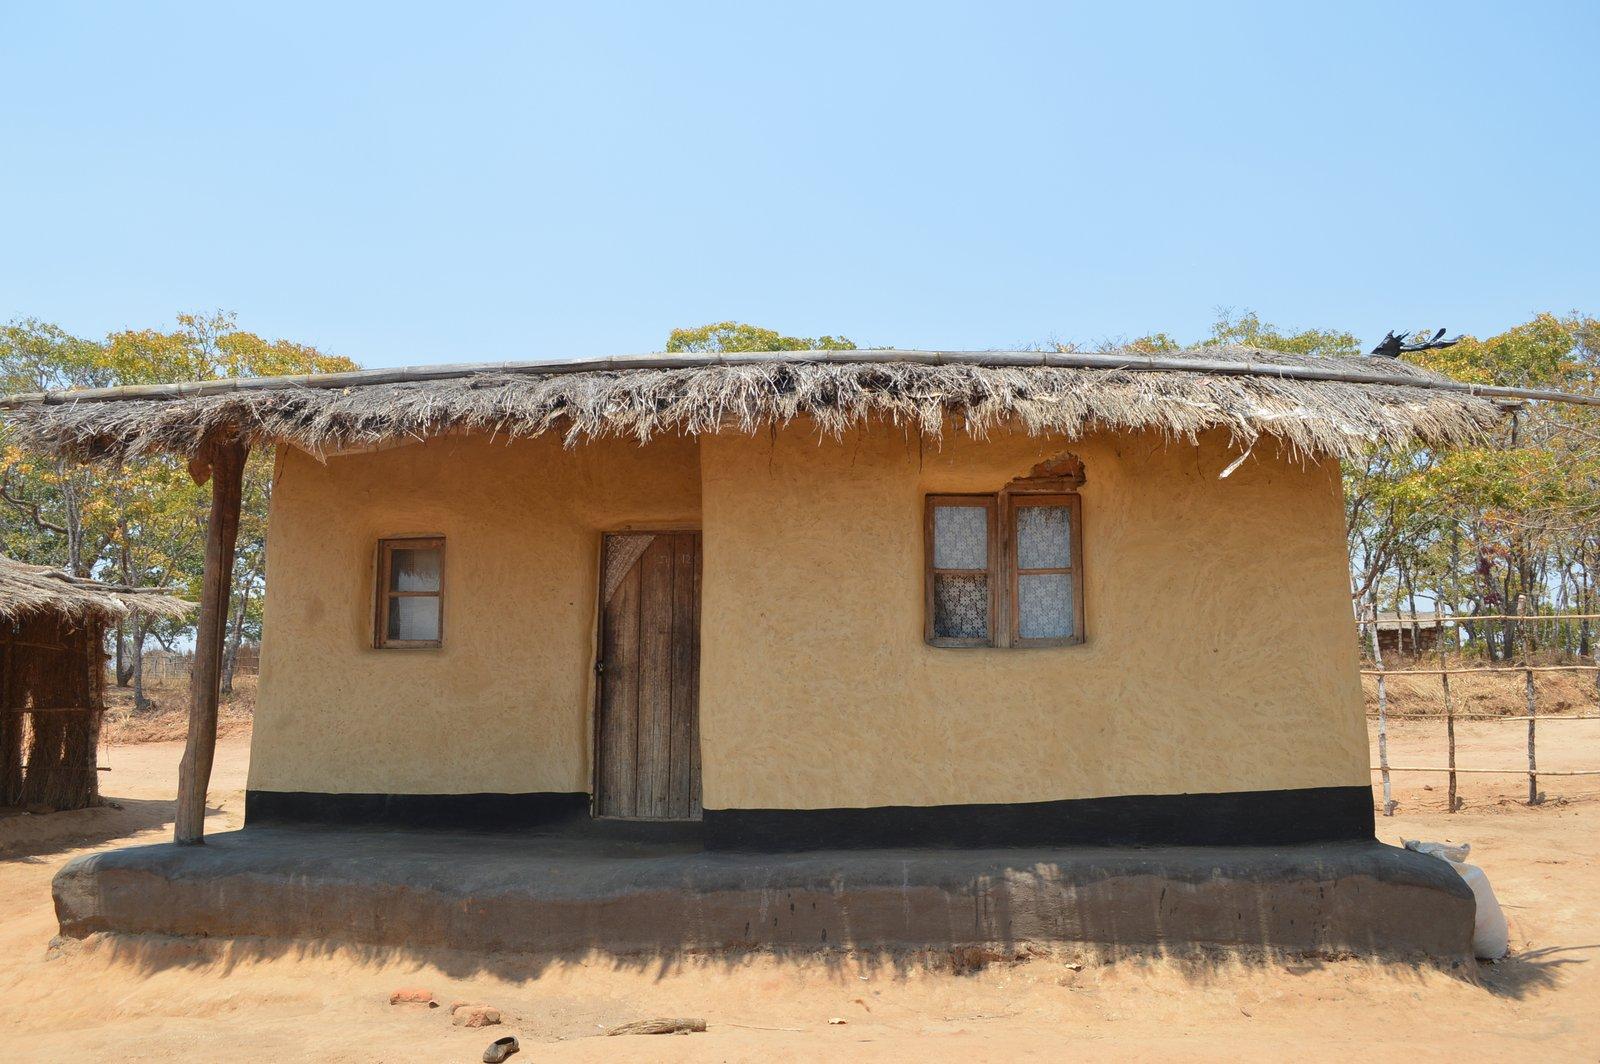 Malawi Vernacular Architecture (2)